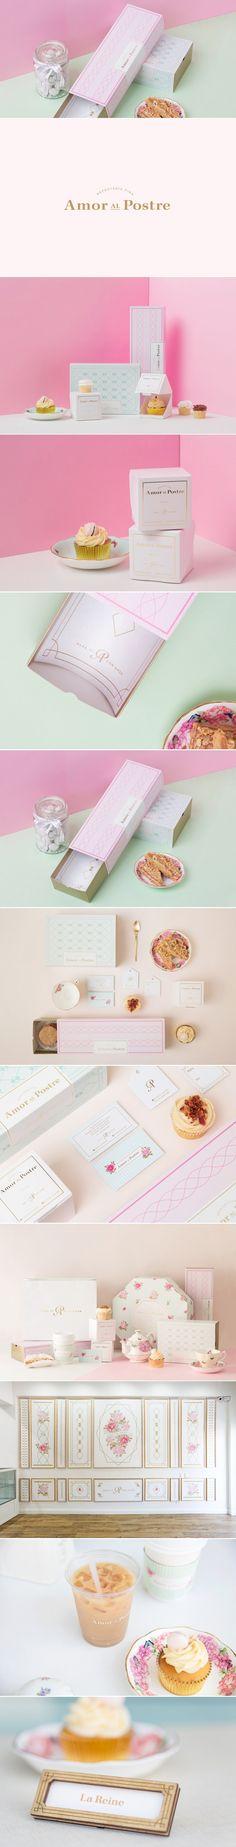 Amor al Postre — The Dieline | Packaging & Branding Design & Innovation News